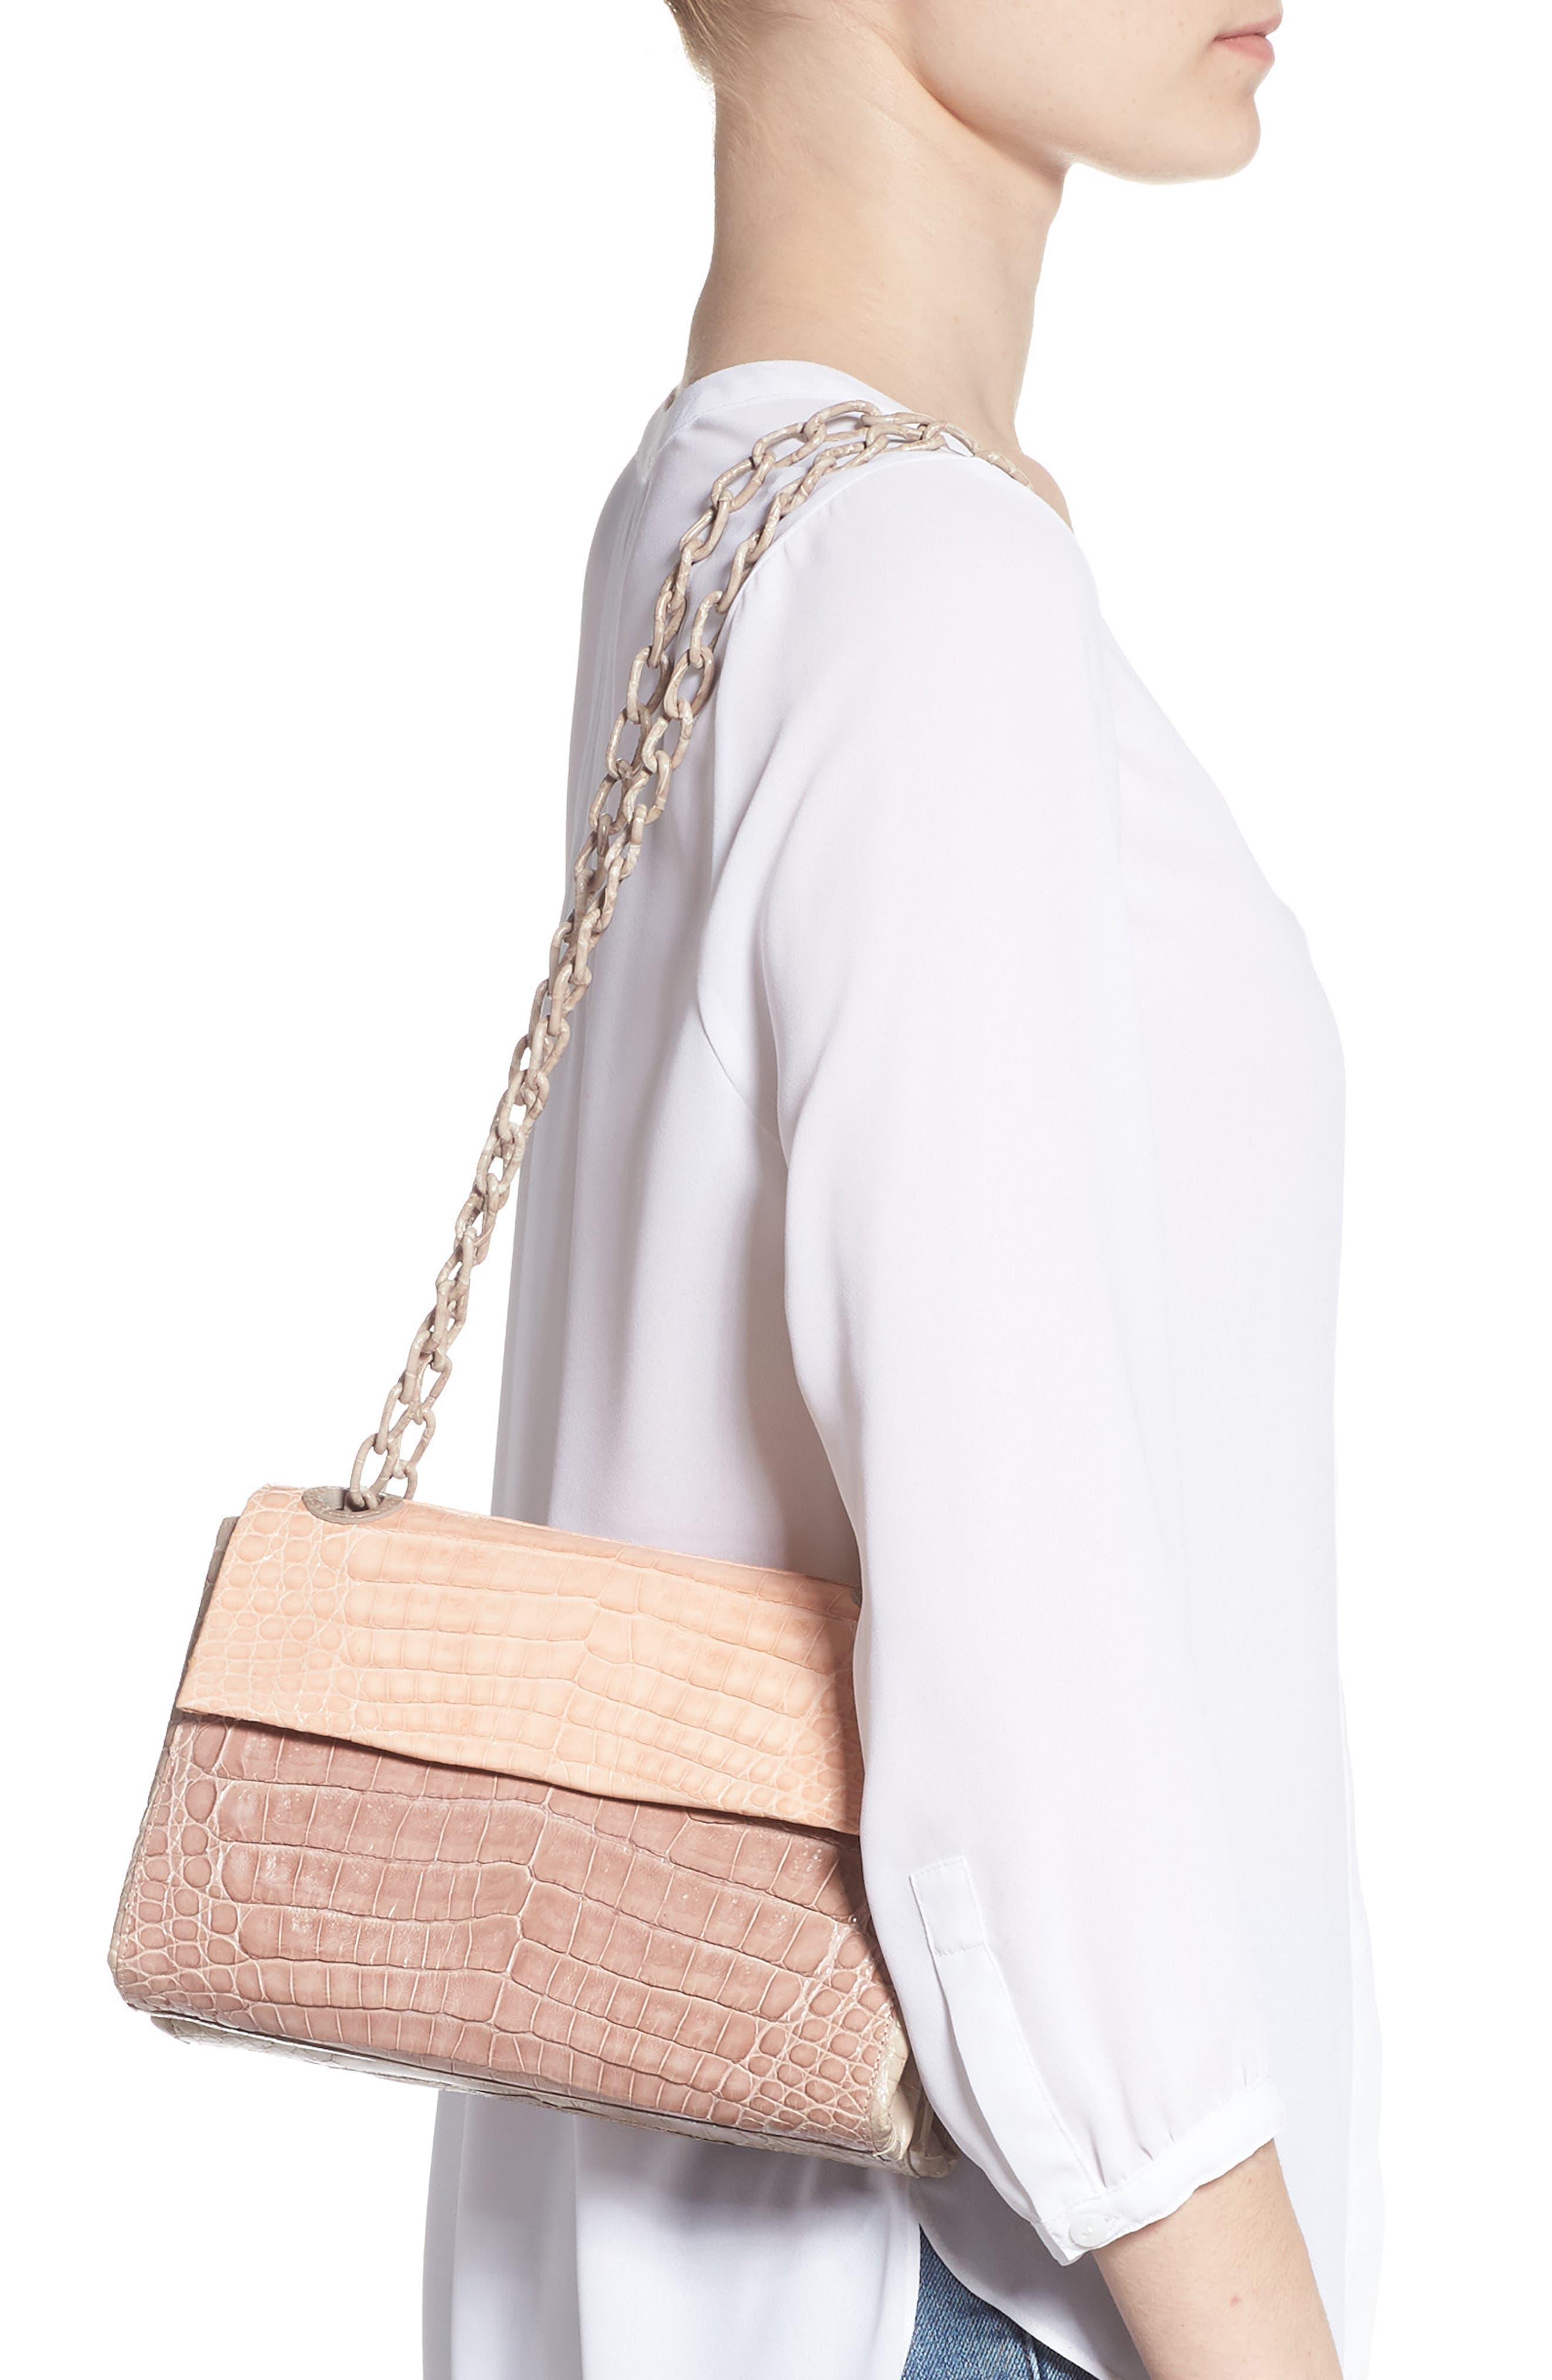 Small Madison Genuine Crocodile Shoulder Bag,                             Alternate thumbnail 2, color,                             NUDE/ TAUPE/ BLUSH